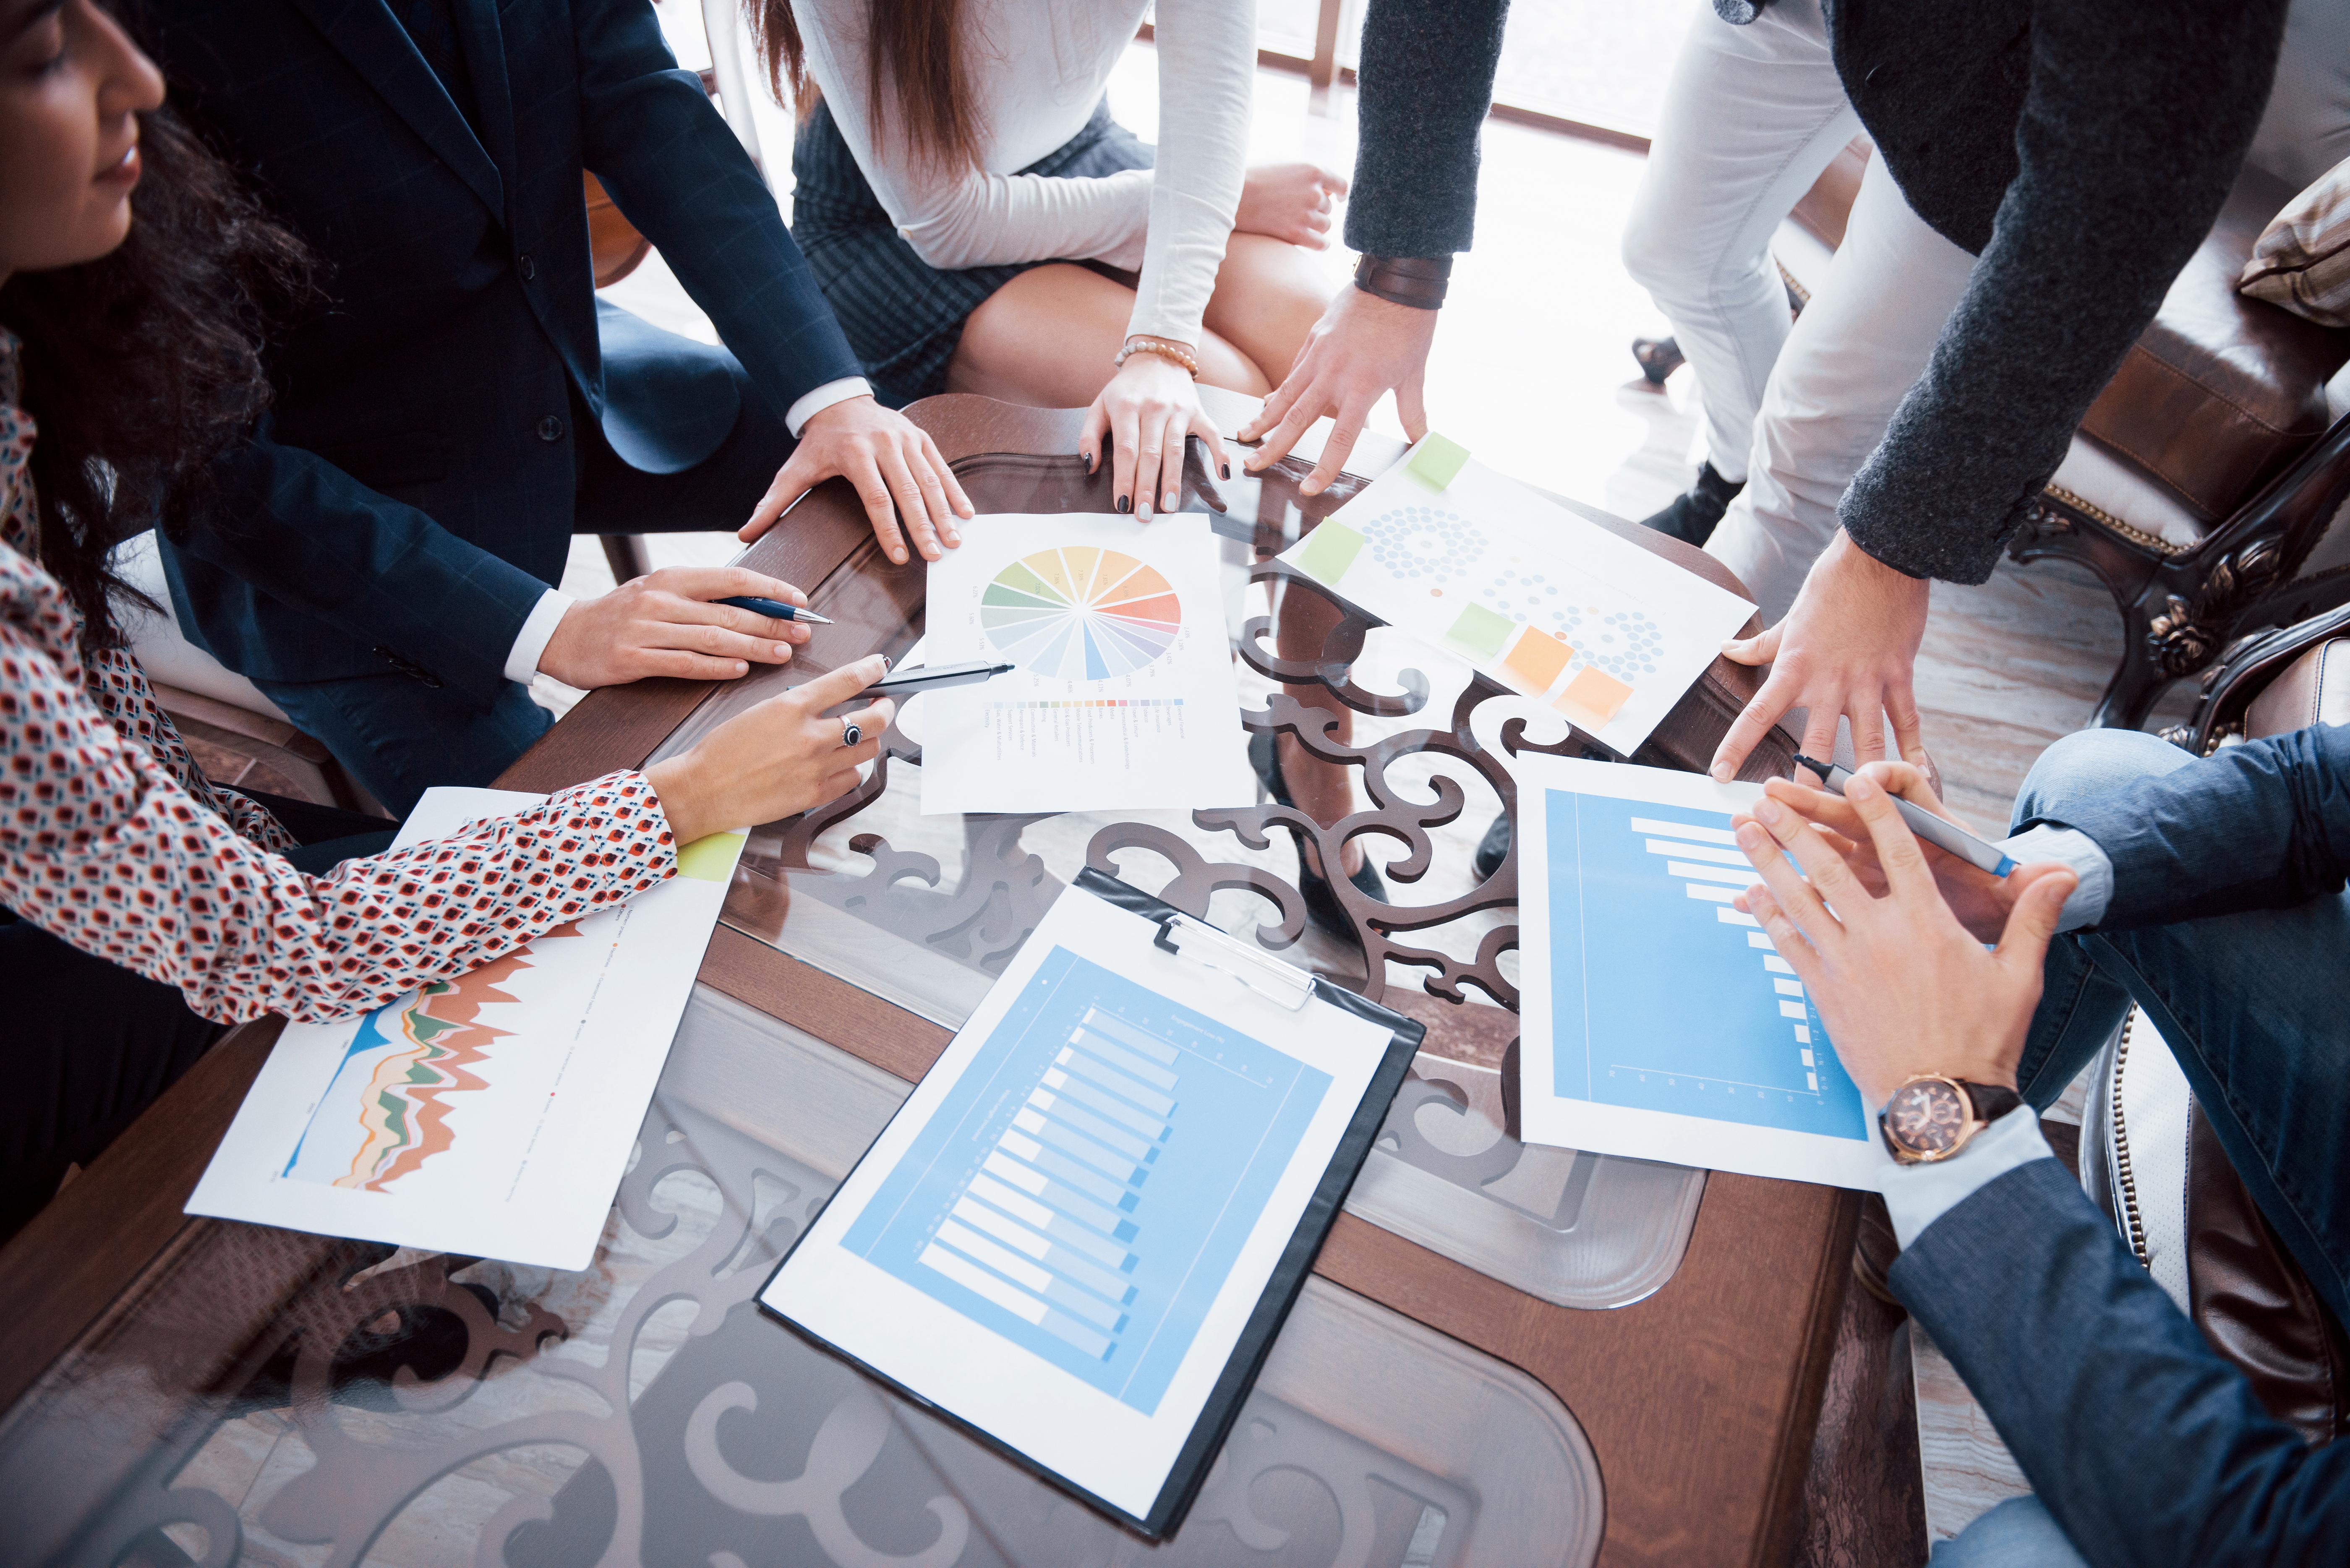 Équipe de recherche marketing en brainstorm